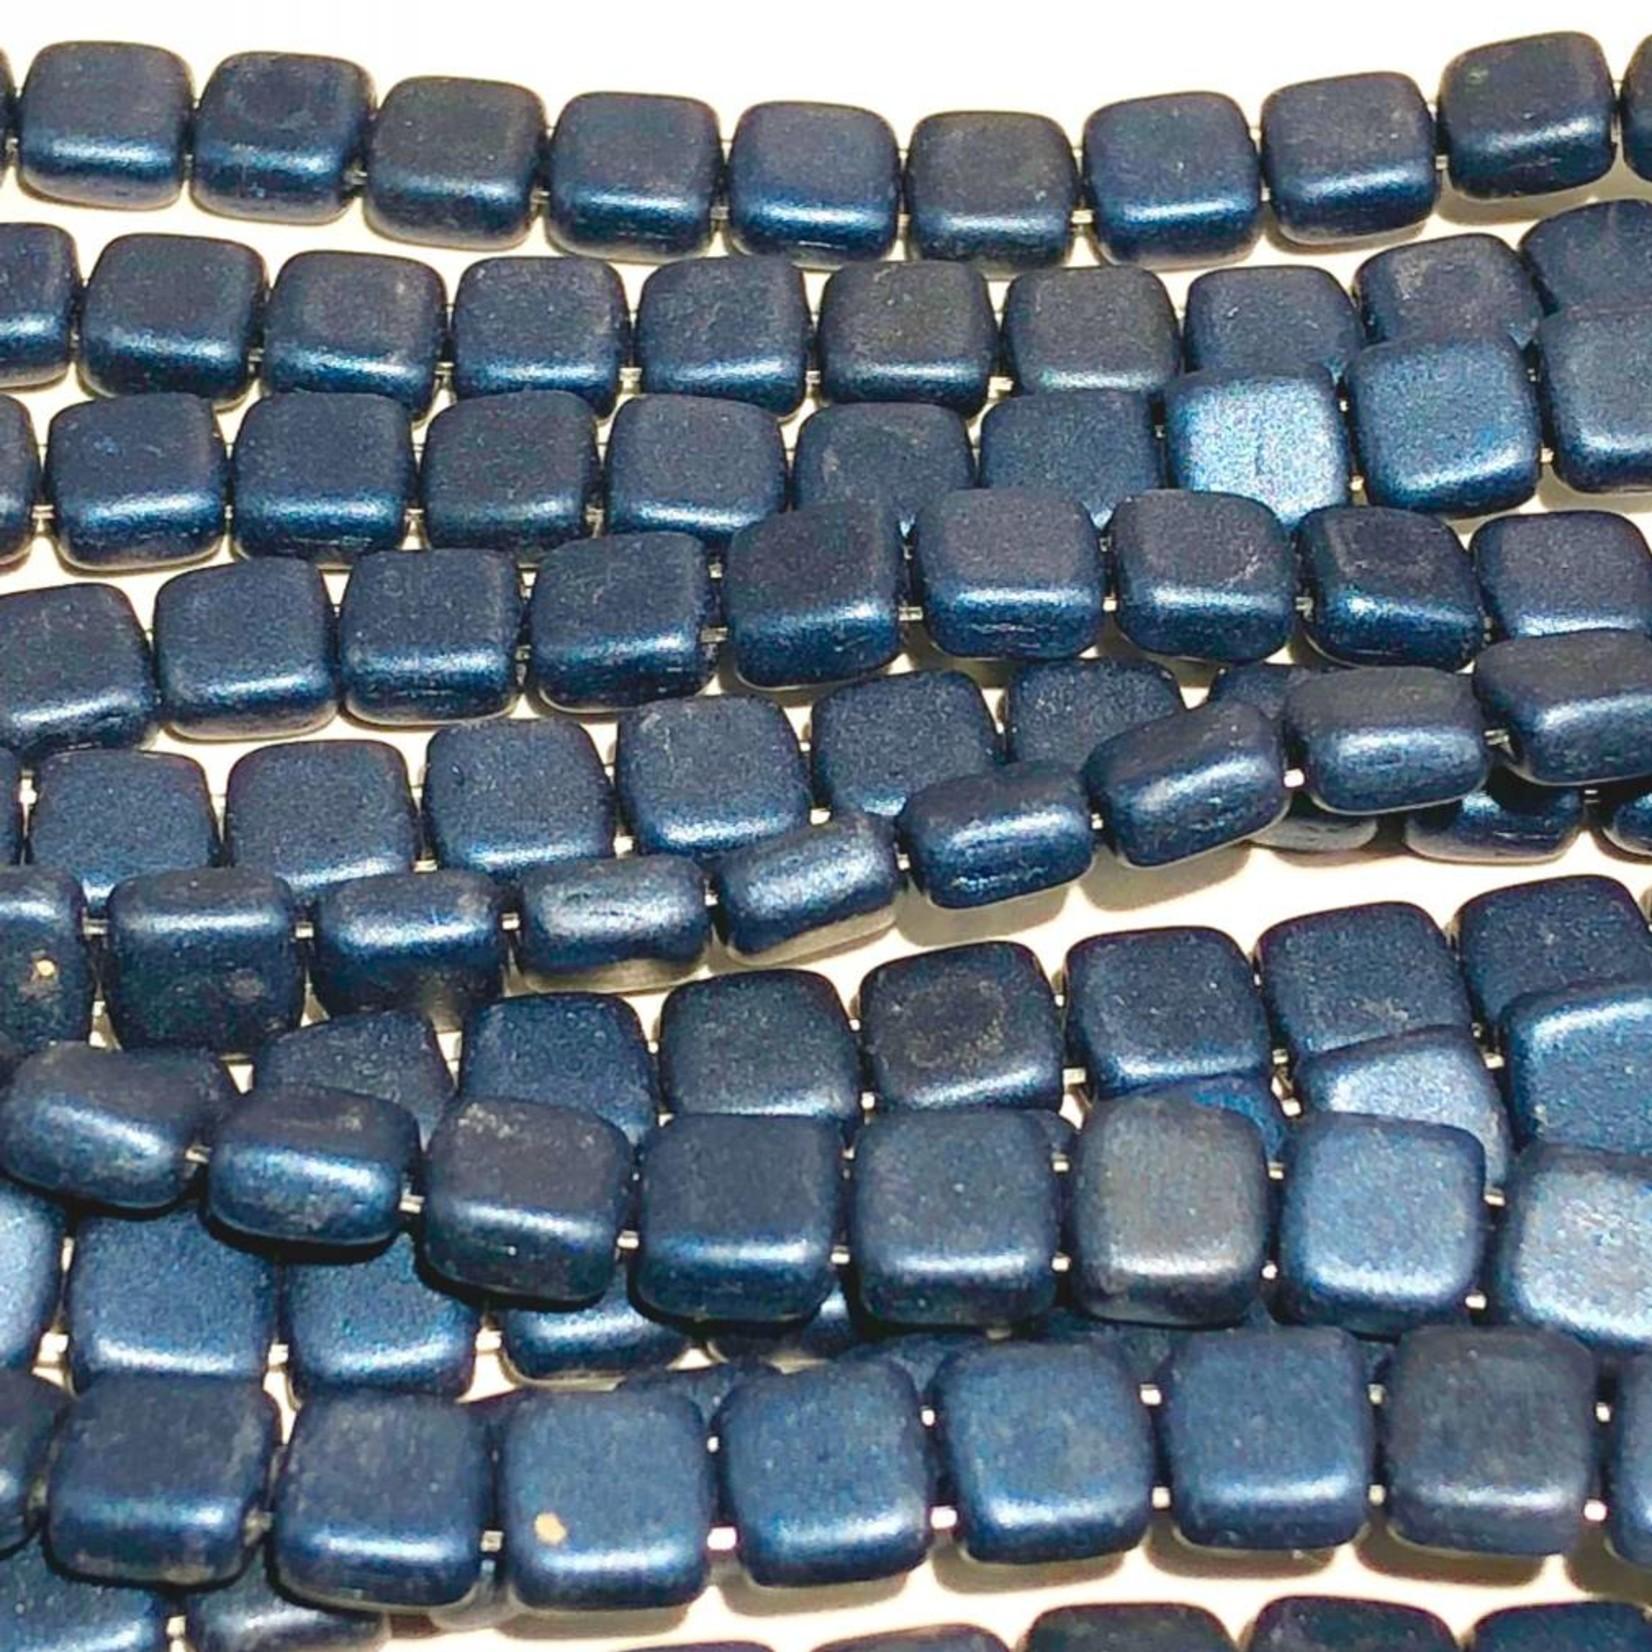 CzechMates TILE Metallic Suede Dark Blue